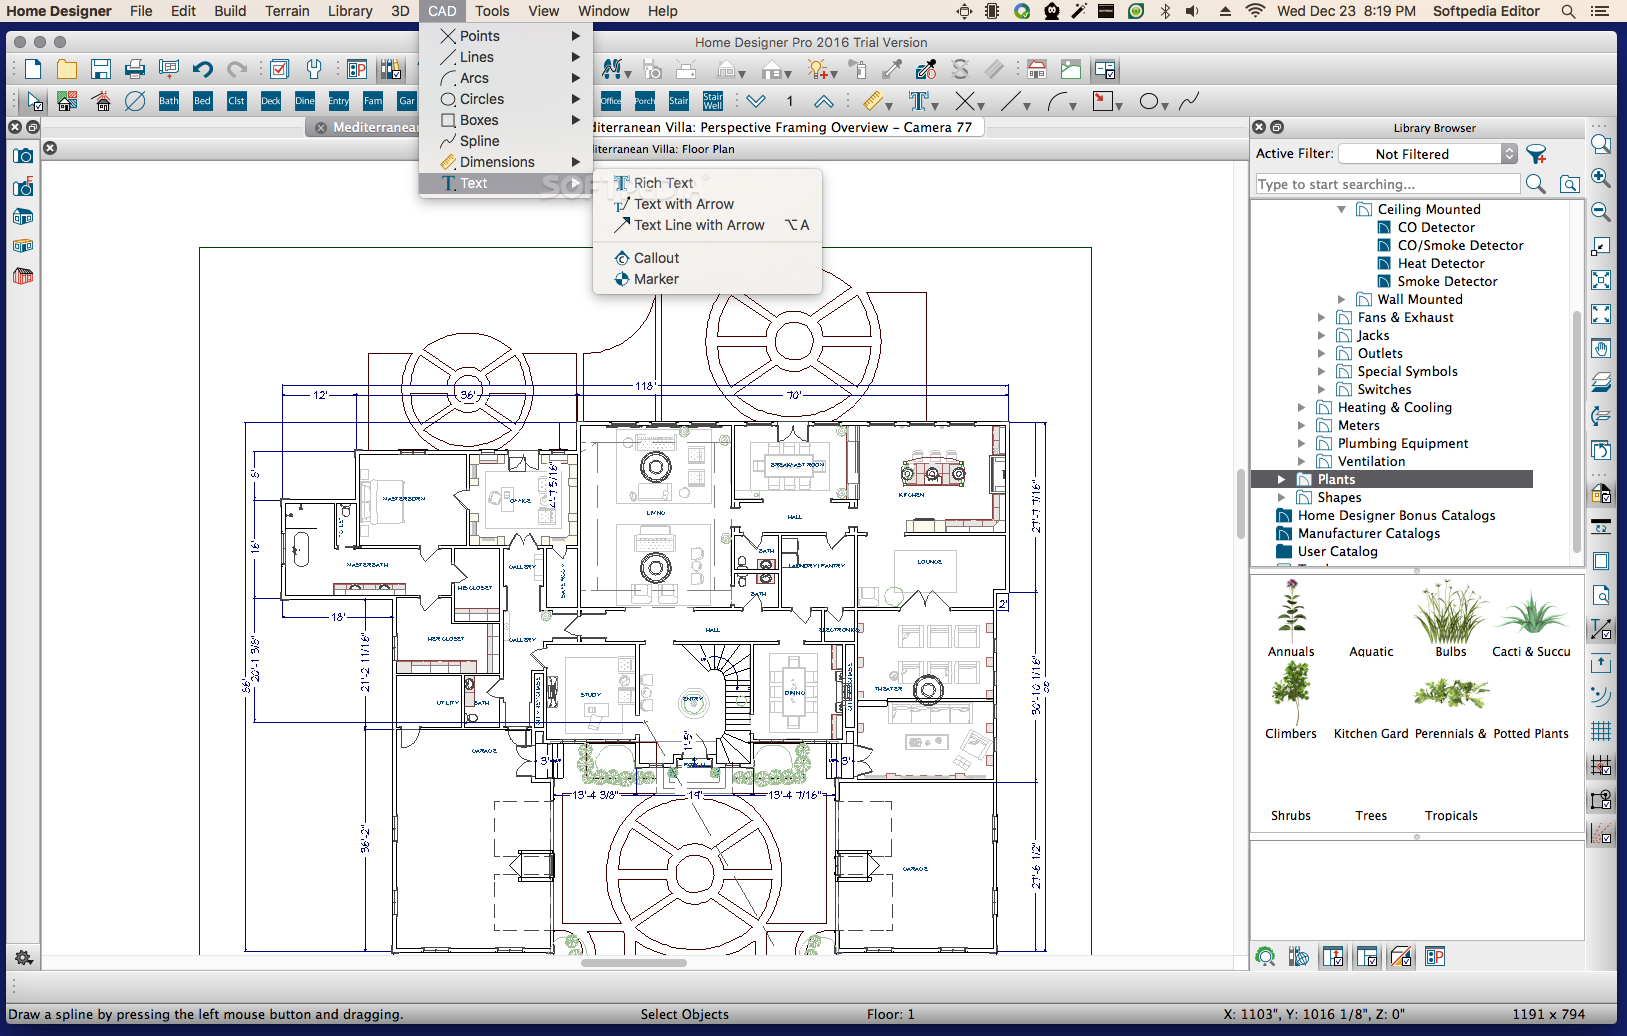 Home Designer Pro Mac 2021 22.1.1 - Download